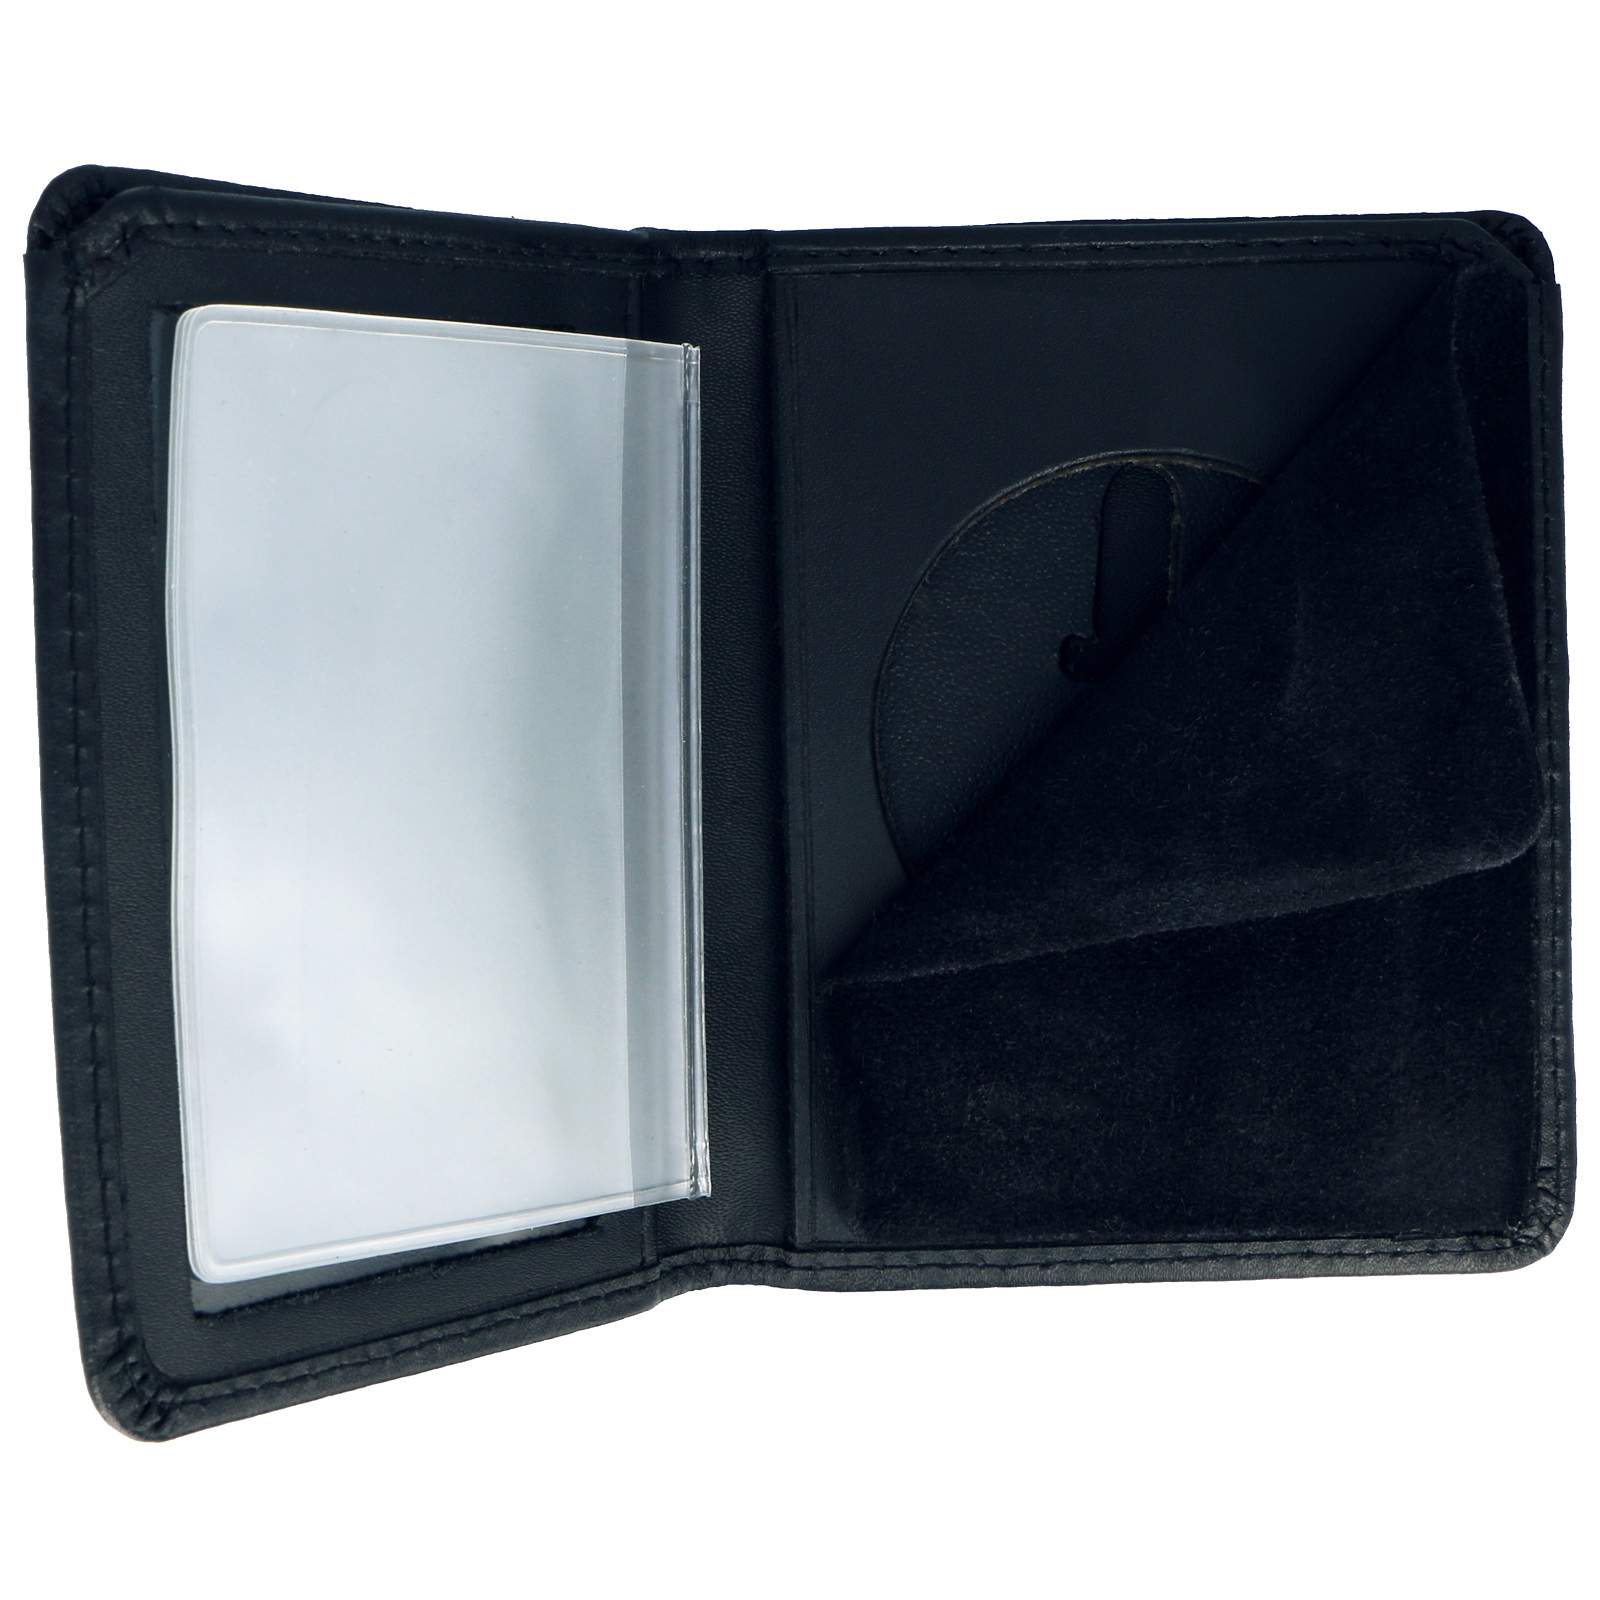 ASR Federal ID Document Holder Law Enforcement Badge Case Unisex Wallet - Round